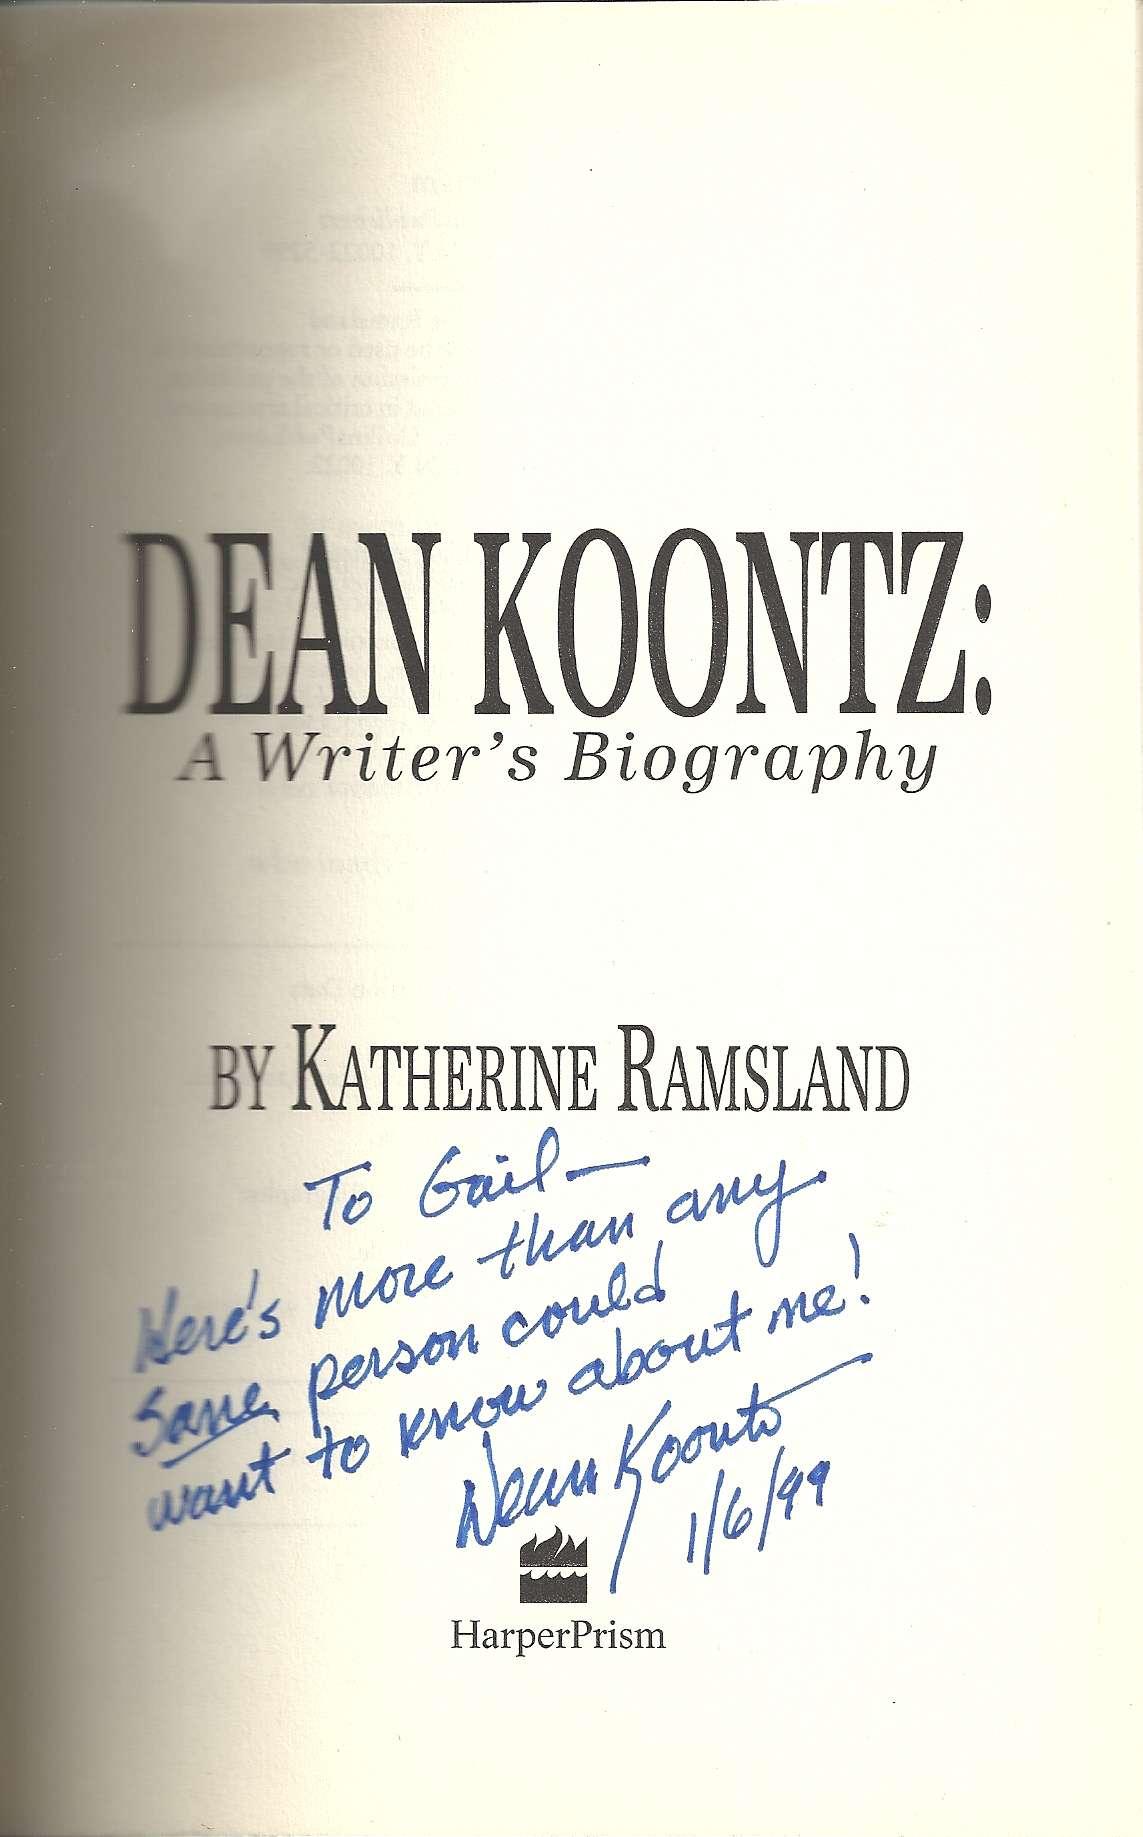 Dean Koontz: A Writer's Biography, Ramsland, Katherine